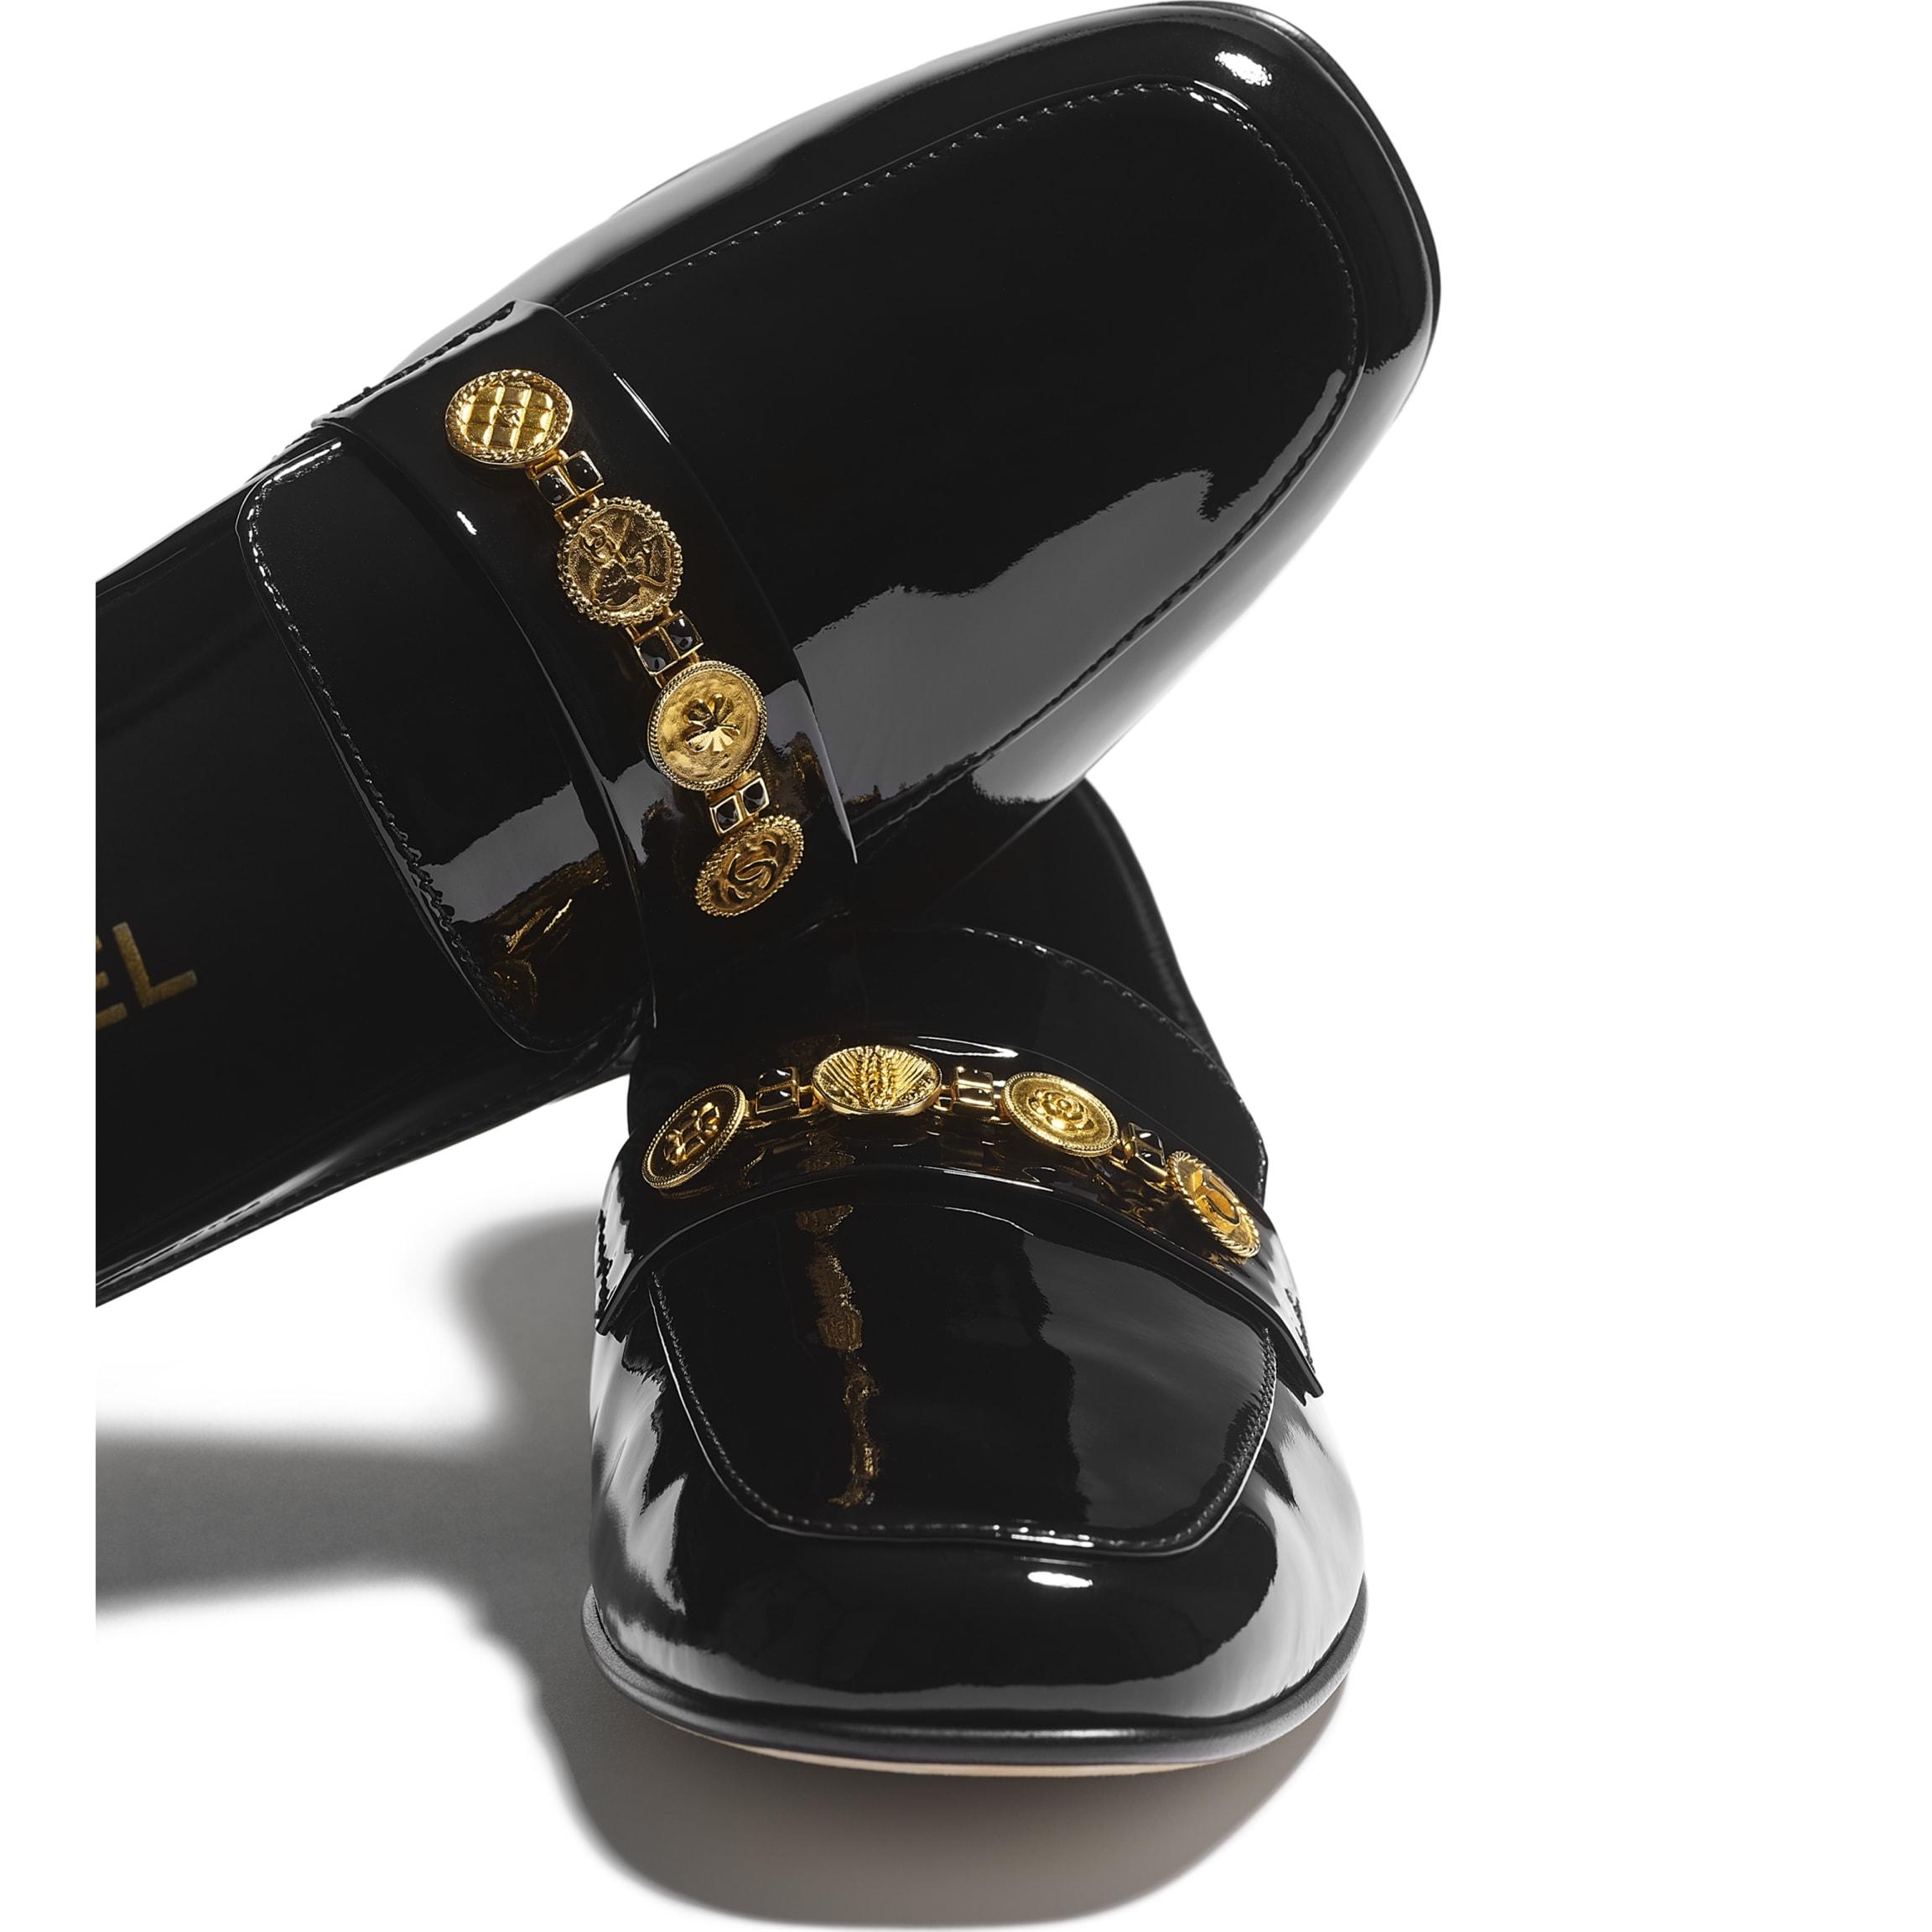 CHANEL 便服鞋 HK$ 8500